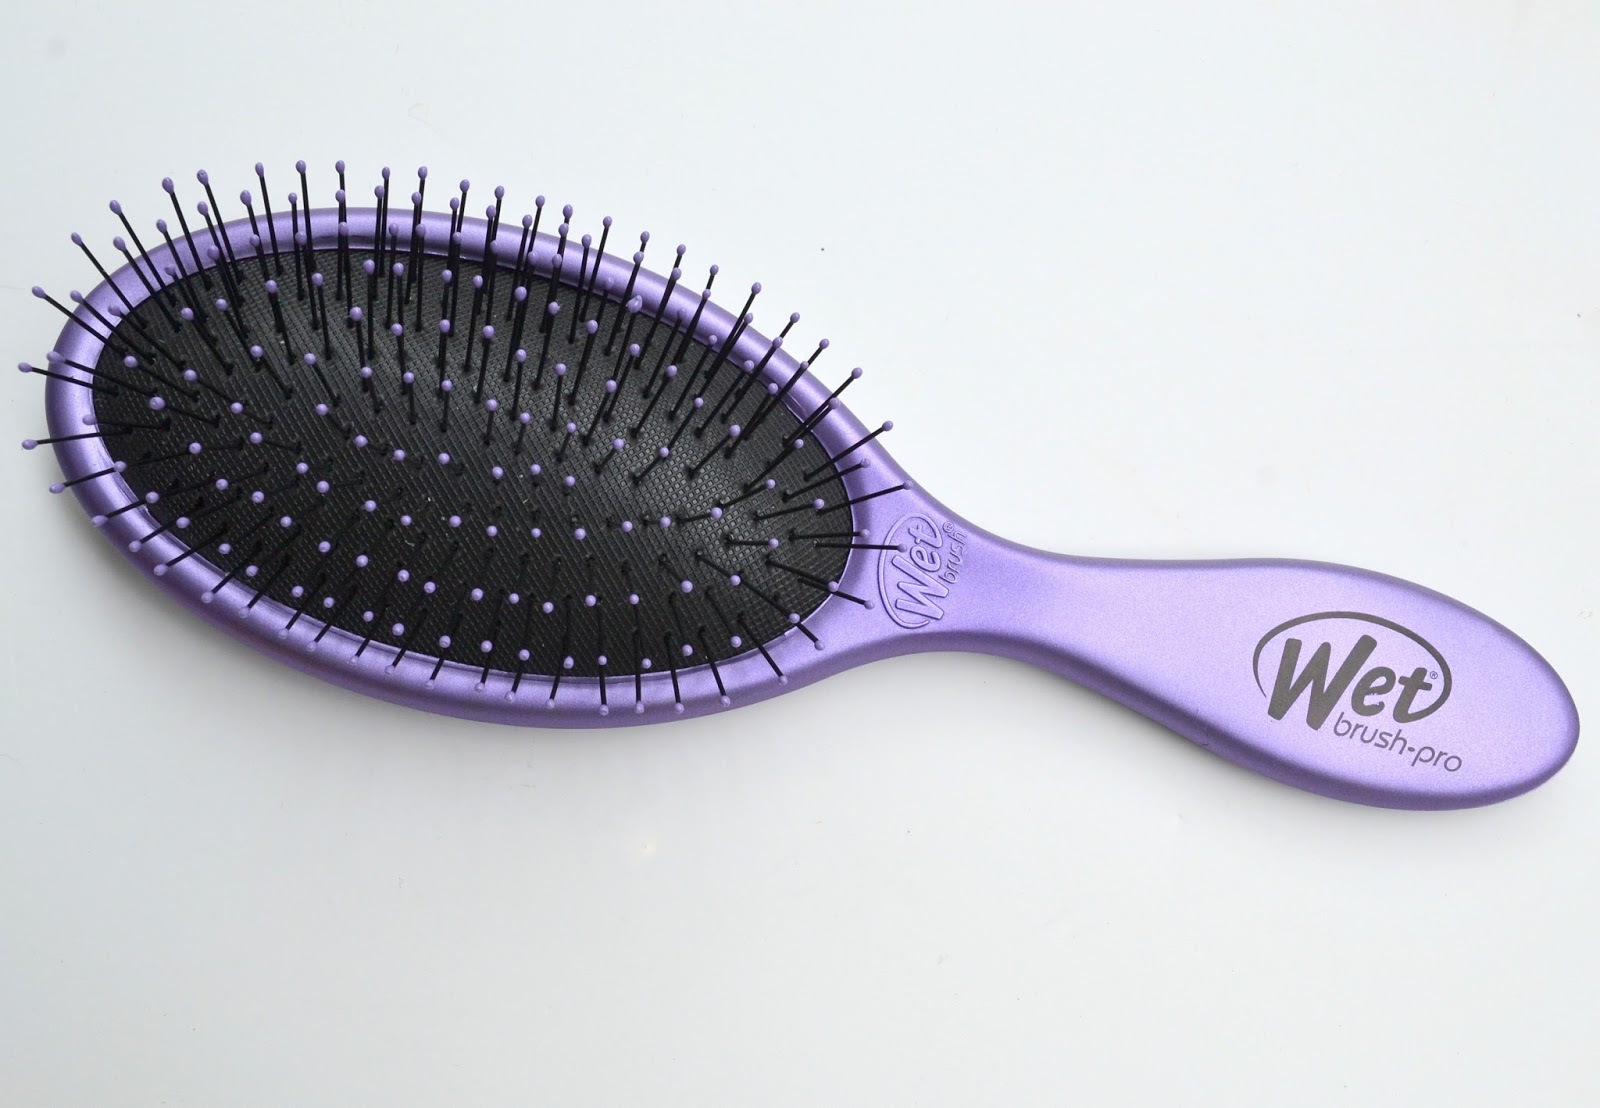 Hair The Wet Brush Pro Detangle Professional Vs The